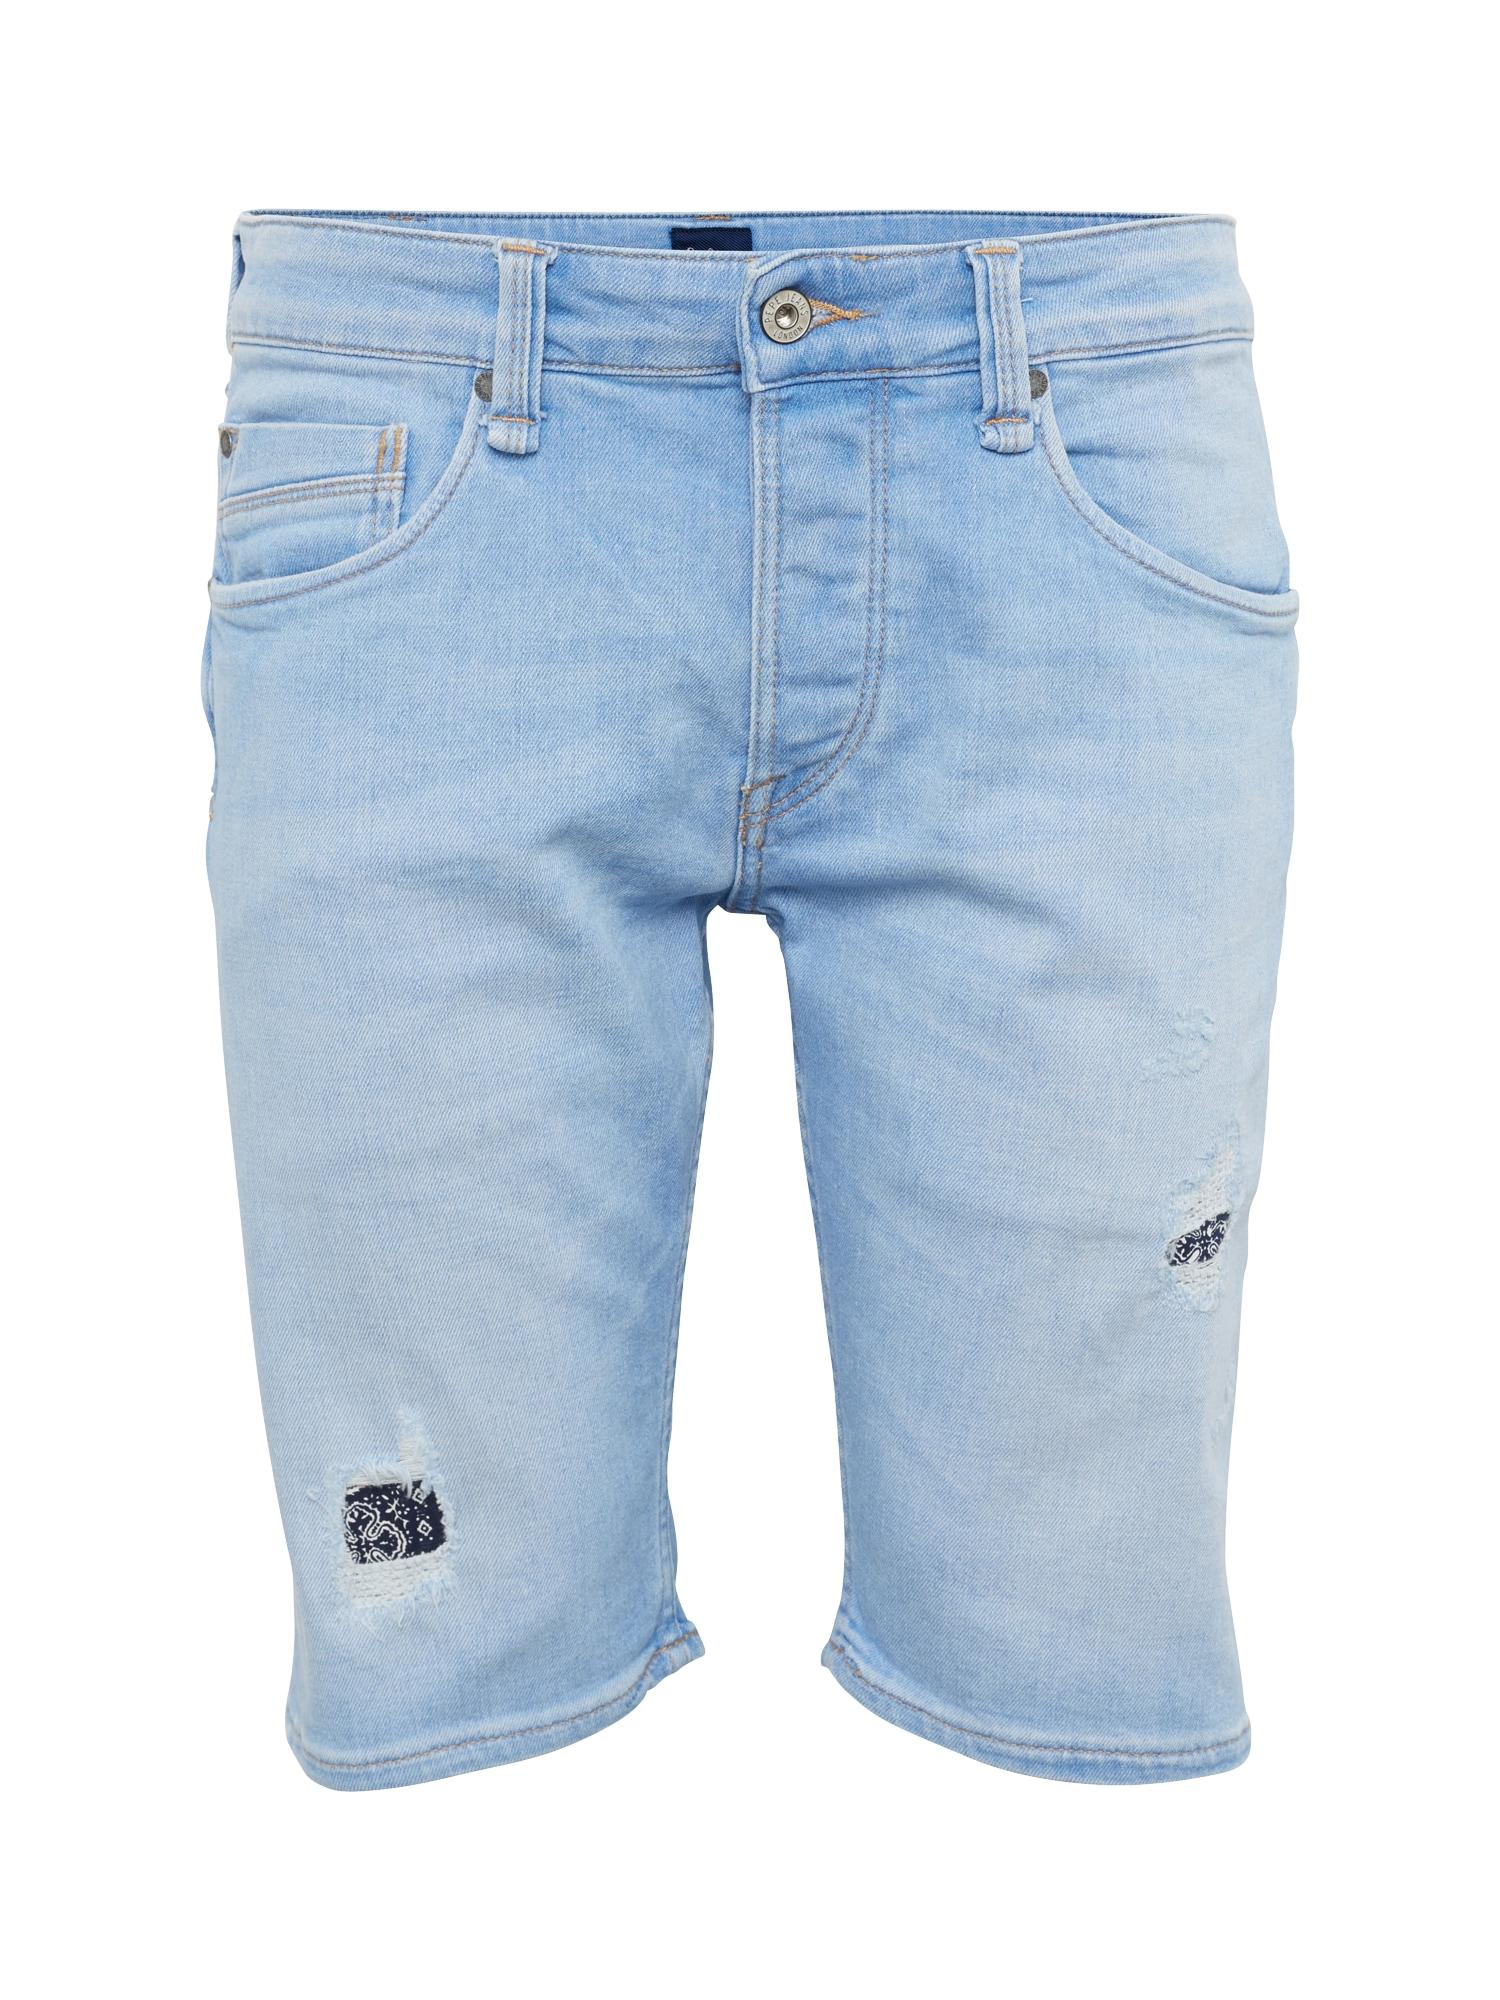 Pepe Jeans Heren Jeans ZINC PATCHED blue denim